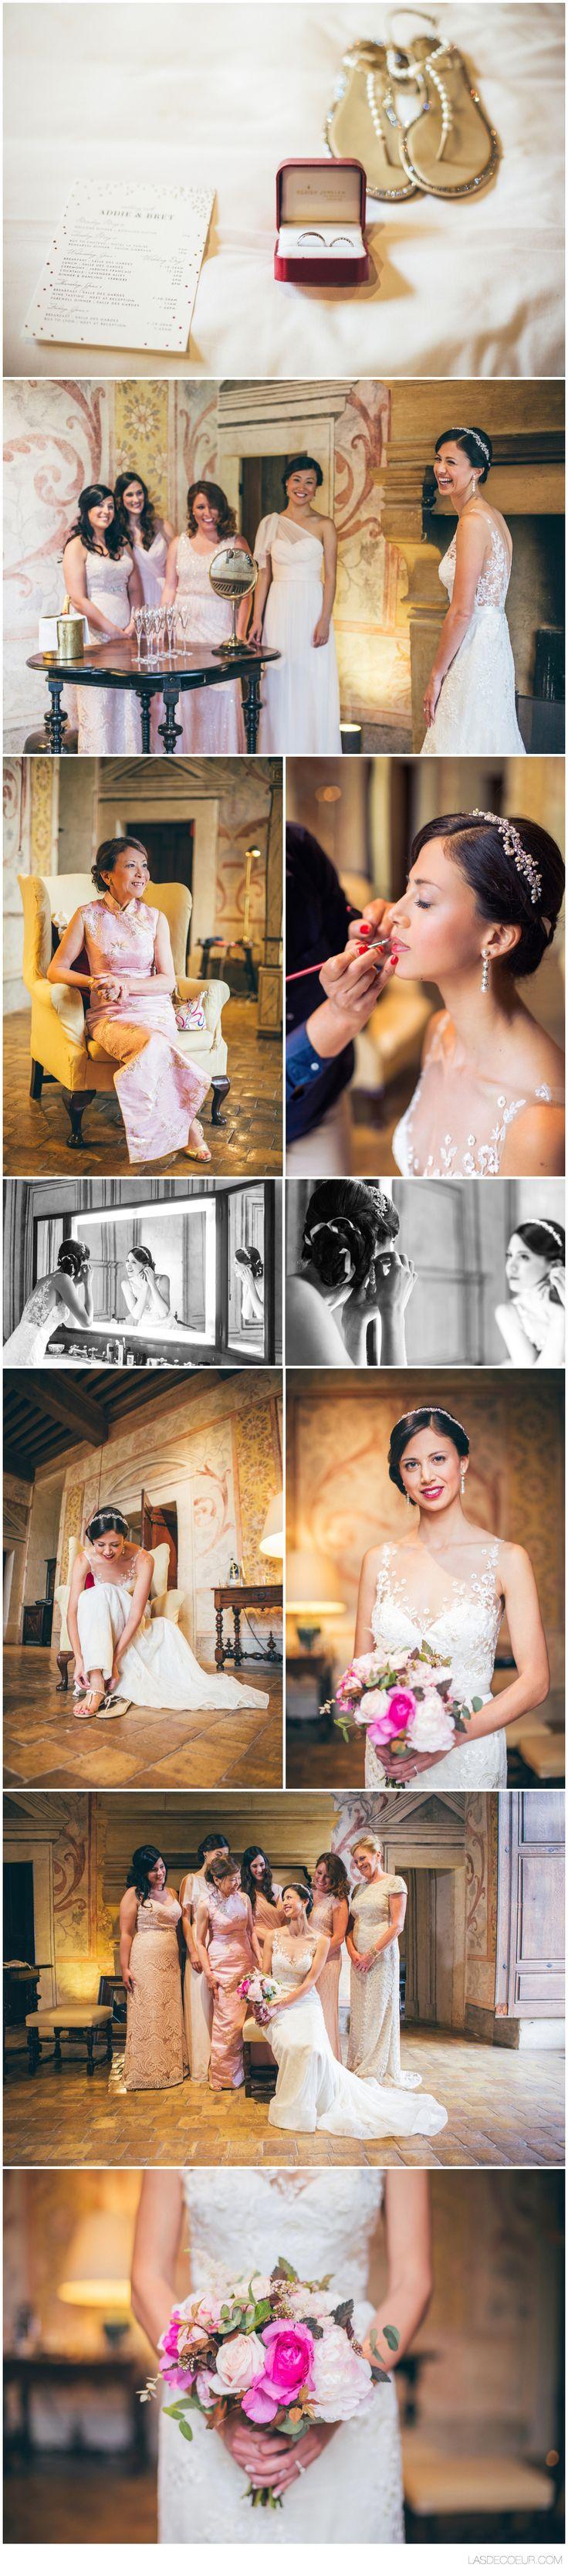 Photo mariage Chateau de Bagnols ©www.lasdecoeur.com - Photo + Cinéma Photo mariage Chateau de Santenay France ©www.lasdecoeur.com - Photo + Cinéma #love #wedding #weddingphotographer #photodecouple #photgraphemariage #lasdecoeurphoto #lovephotography #weddingprep #preparatifmariage #weddingphotography #chateaudeBagnols #Beaujolais